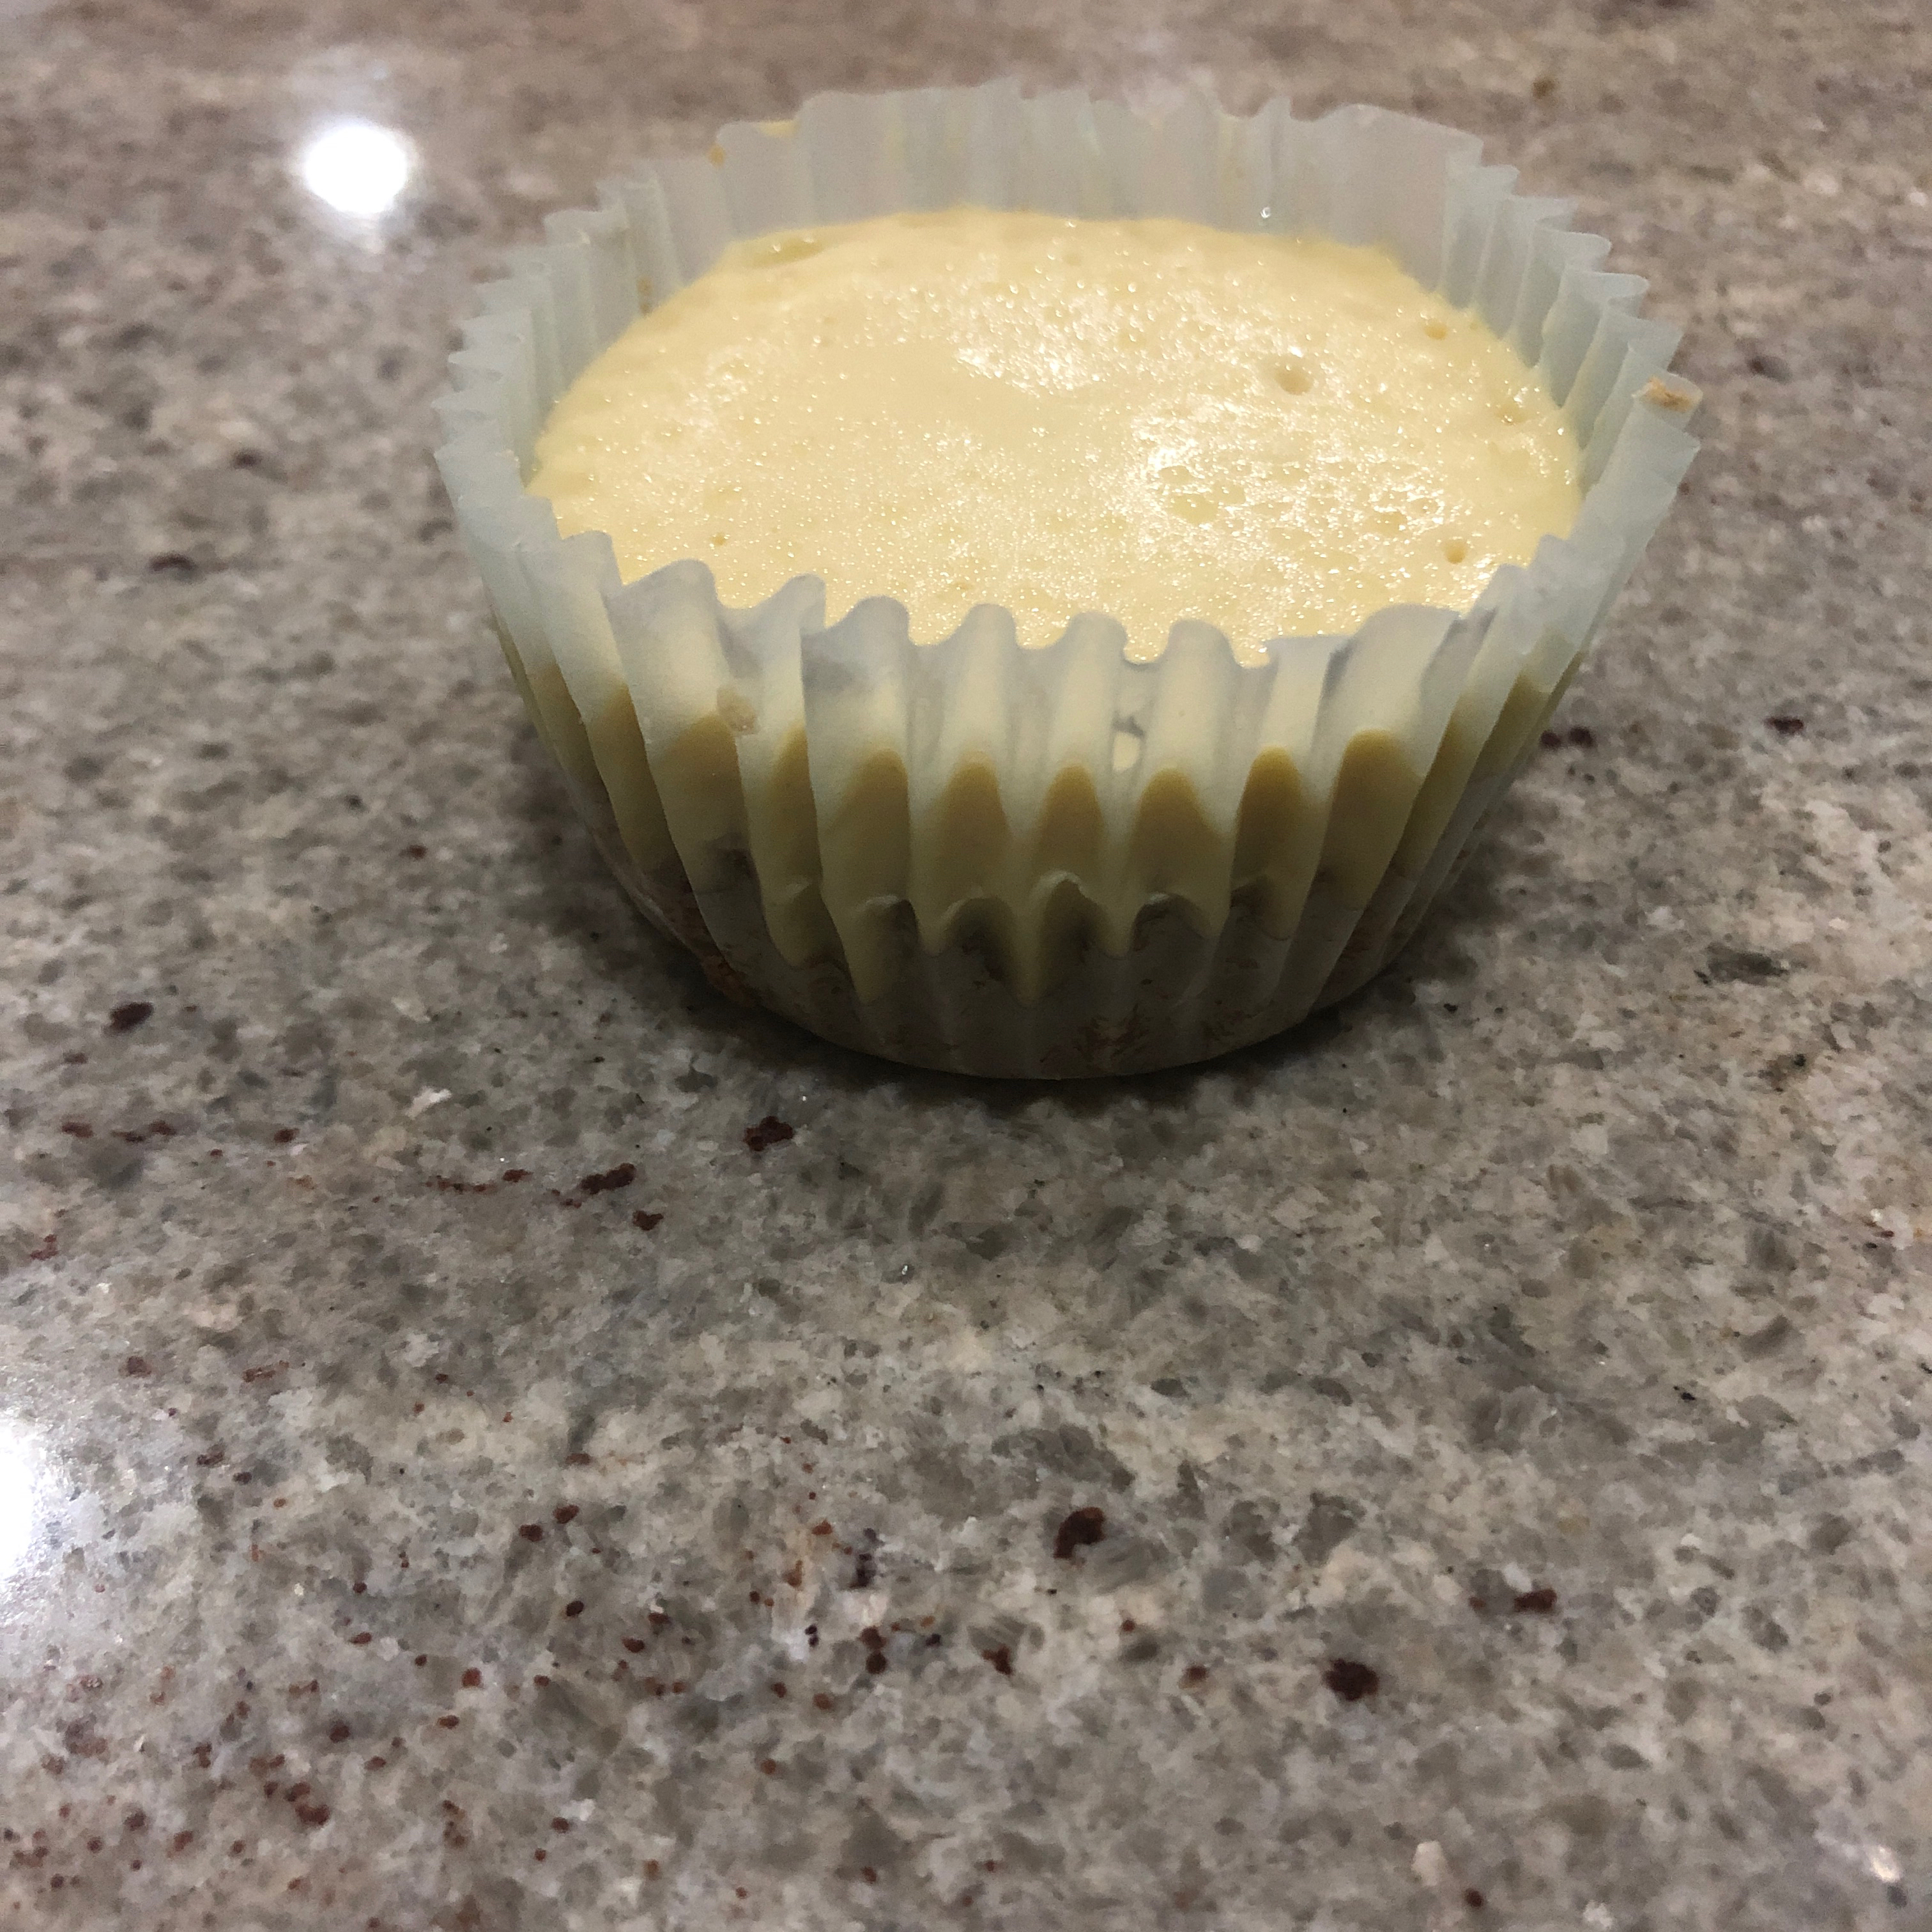 Gluten-Free Cheesecake Cupcakes acheese73